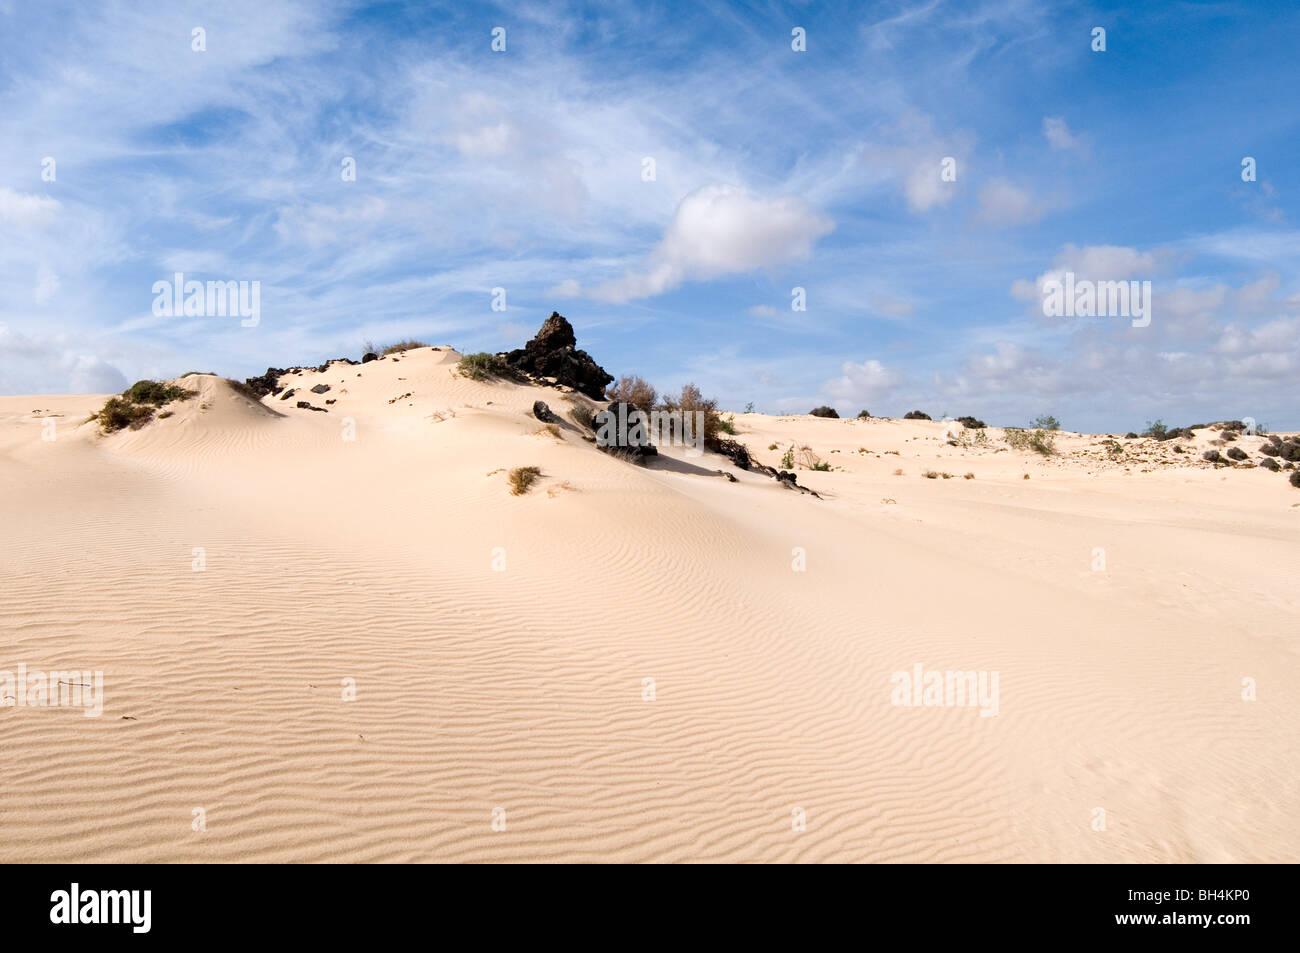 Düne Dünen du Désert Wüsten sandigen blauer Himmel Himmel geblasen Stockfoto